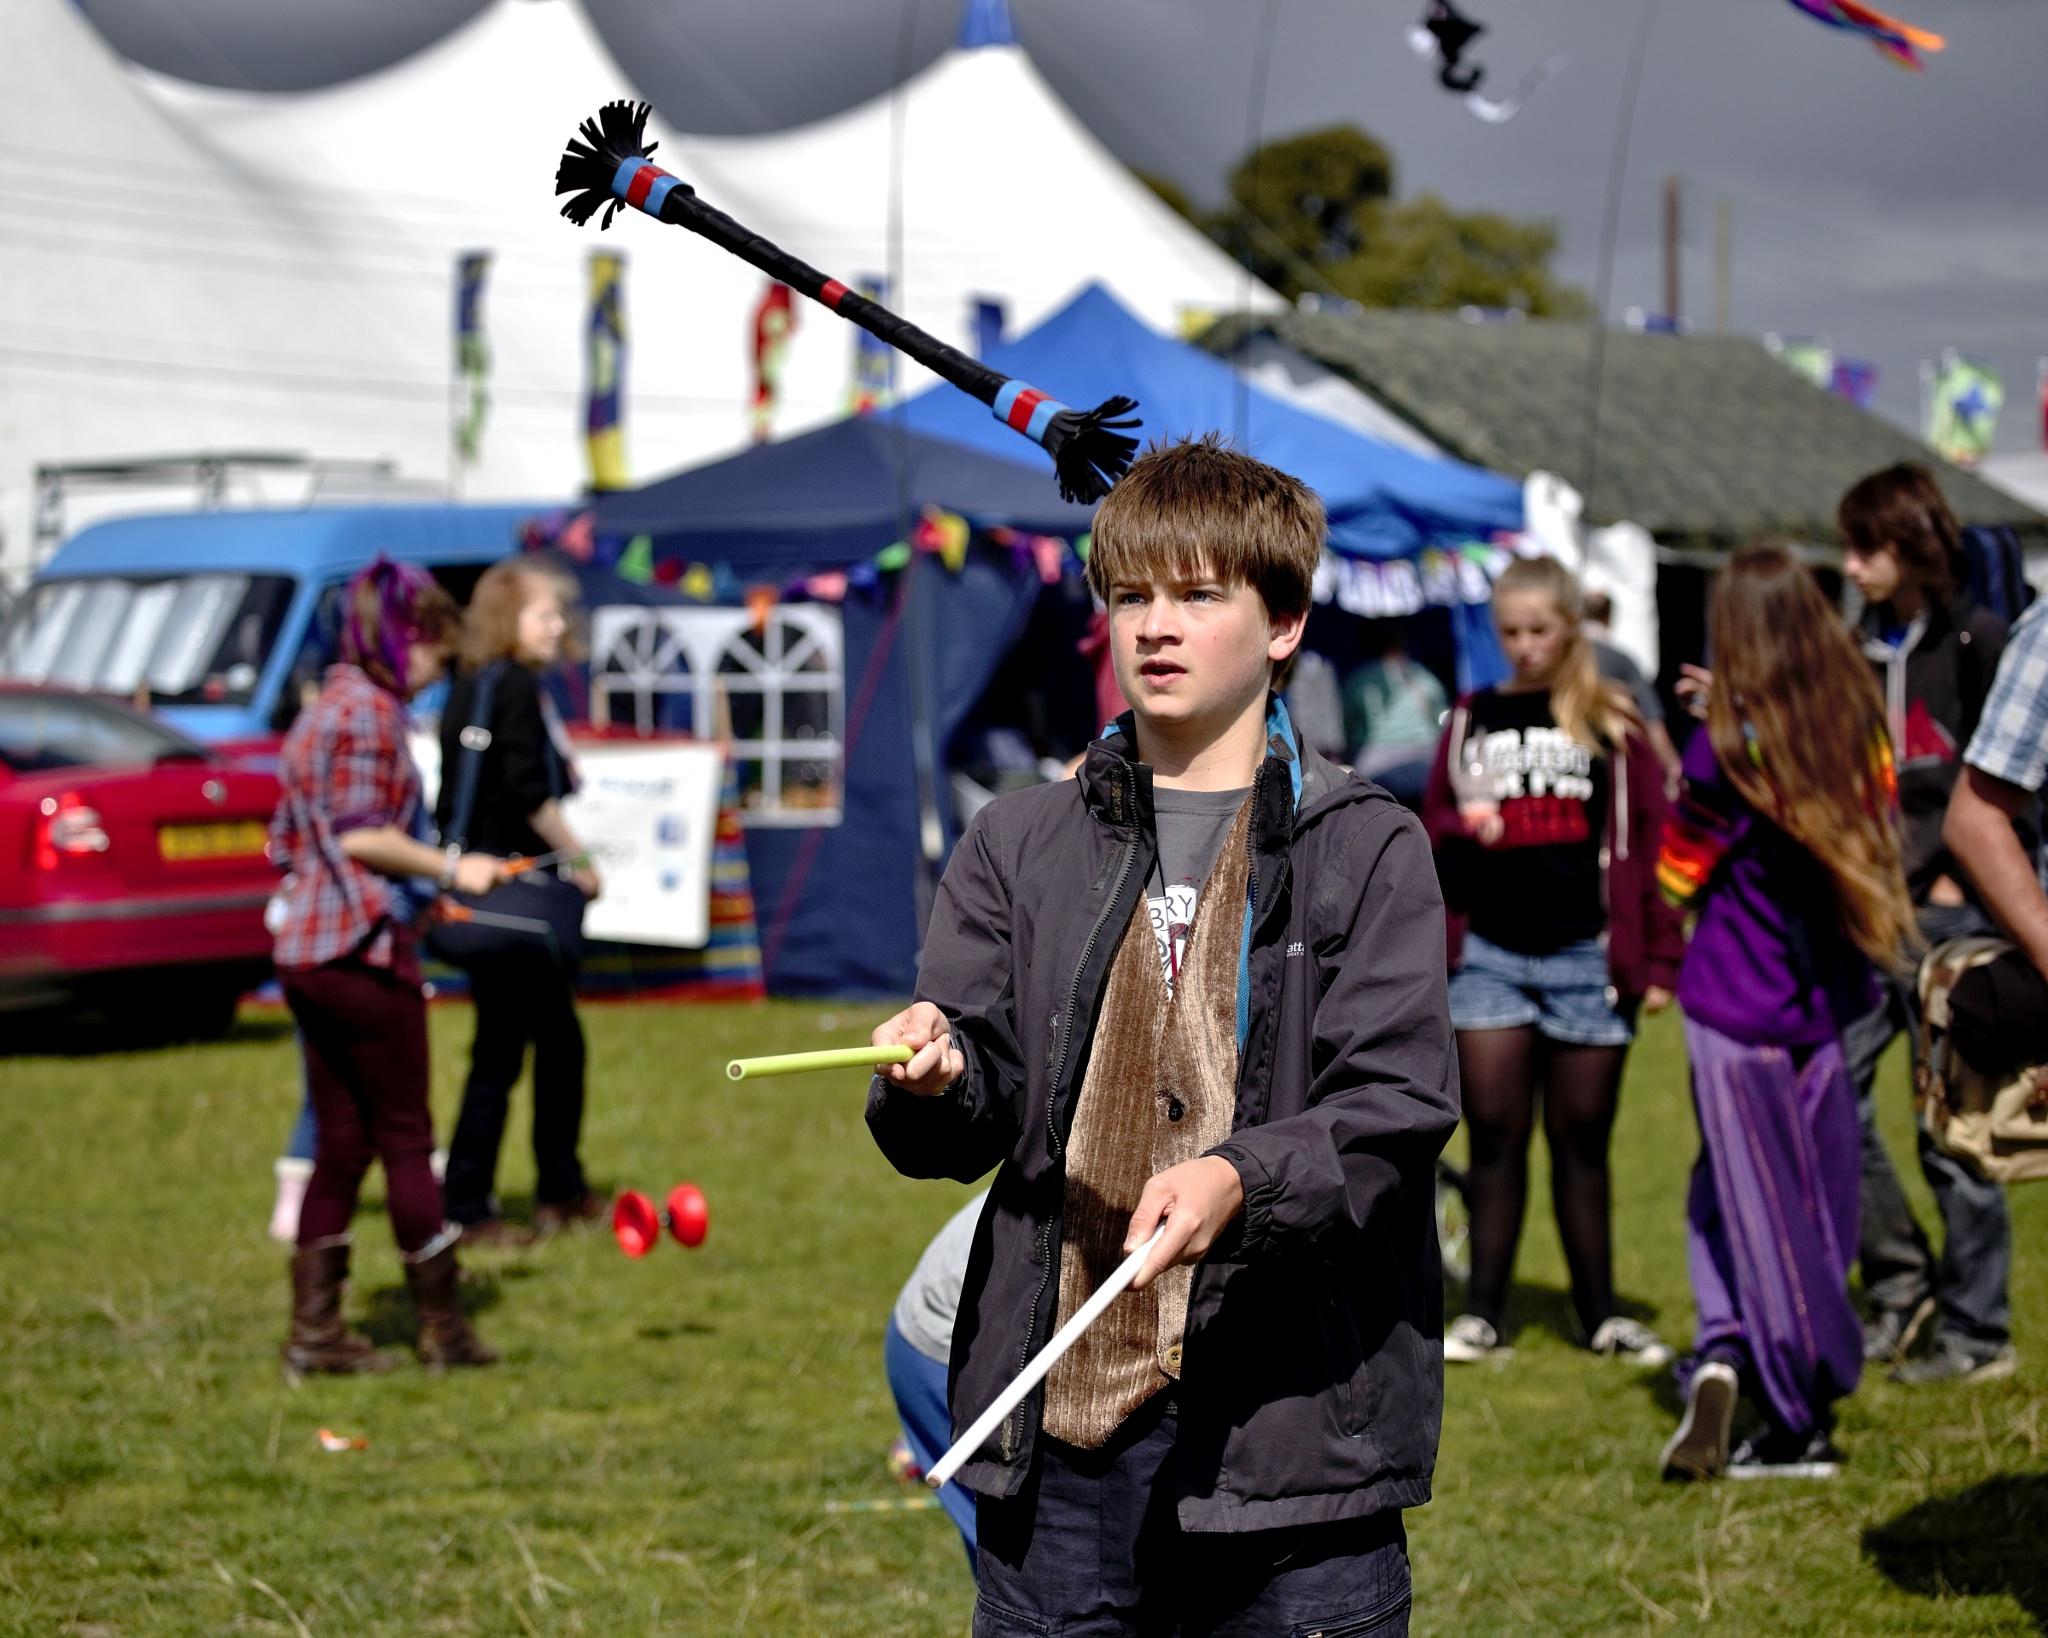 Boy - Juggling Stick  - Colour by paul.hosker